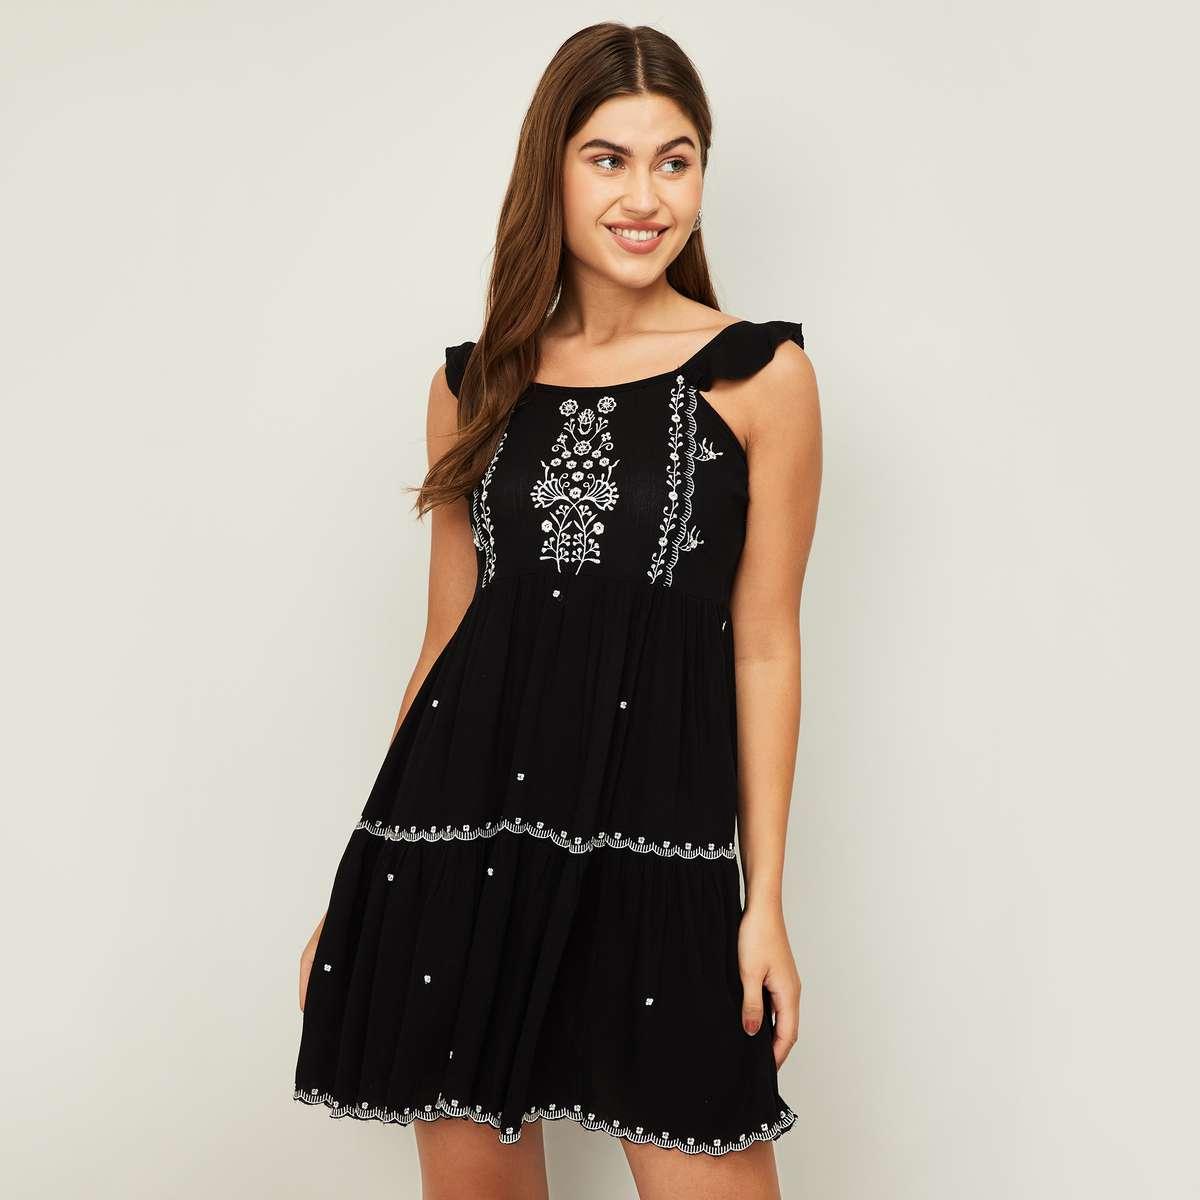 3.GINGER Women Embroidered Mini Dress